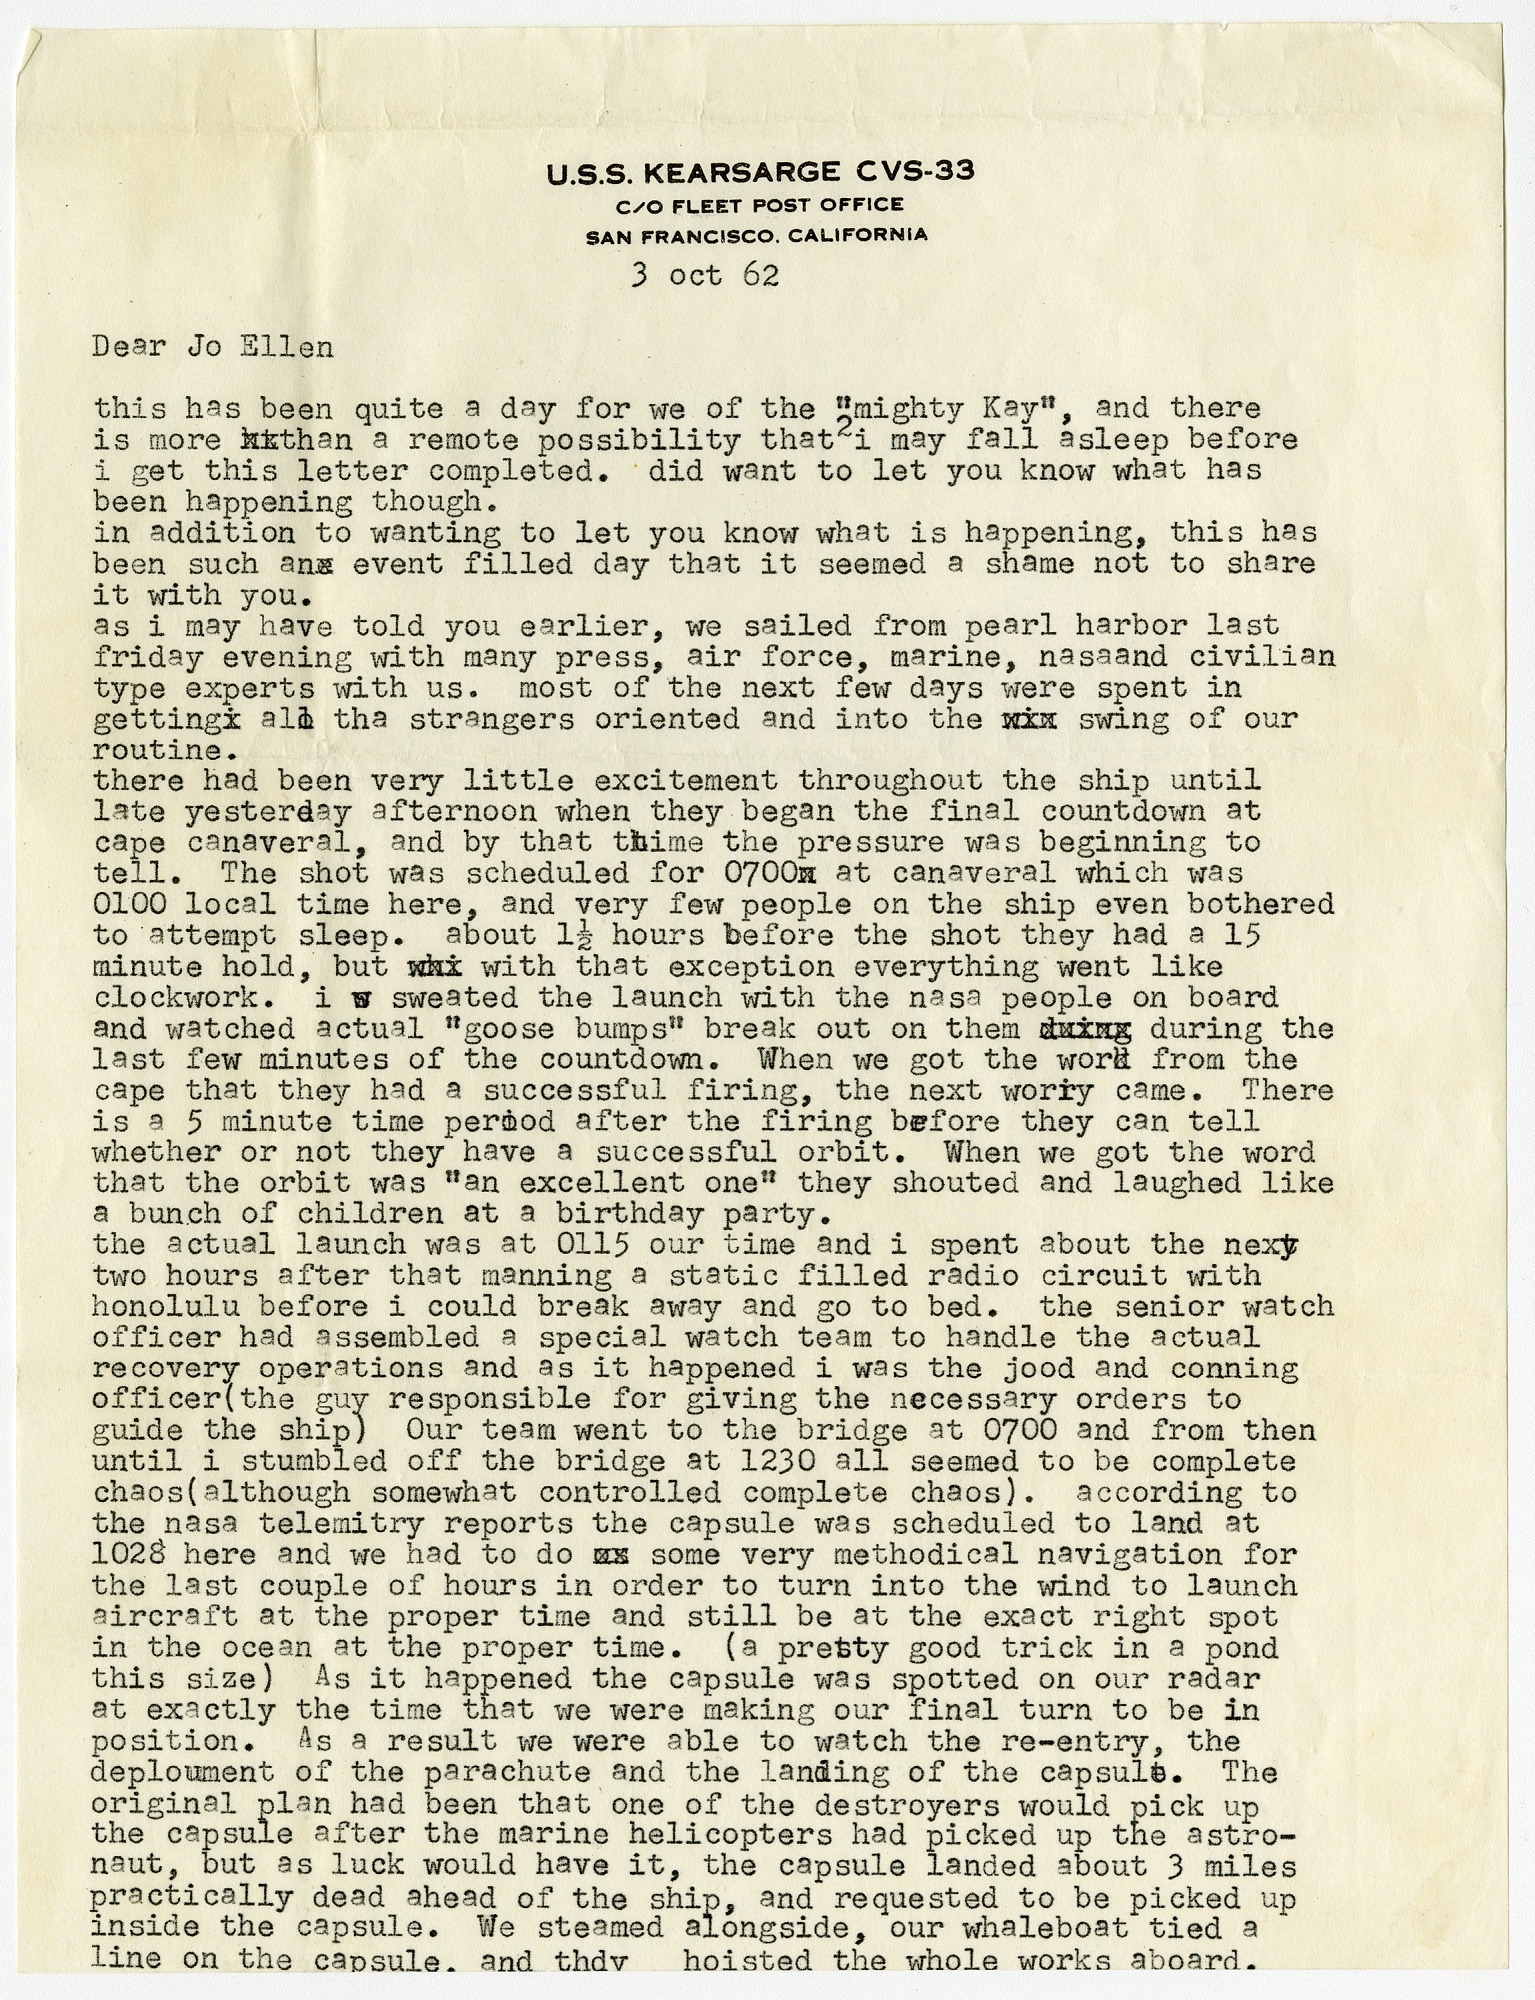 Mercury MA-8 Flight Sigma 7 and Mercury MA-9 Flight Faith 7 Recovery Letters Parker